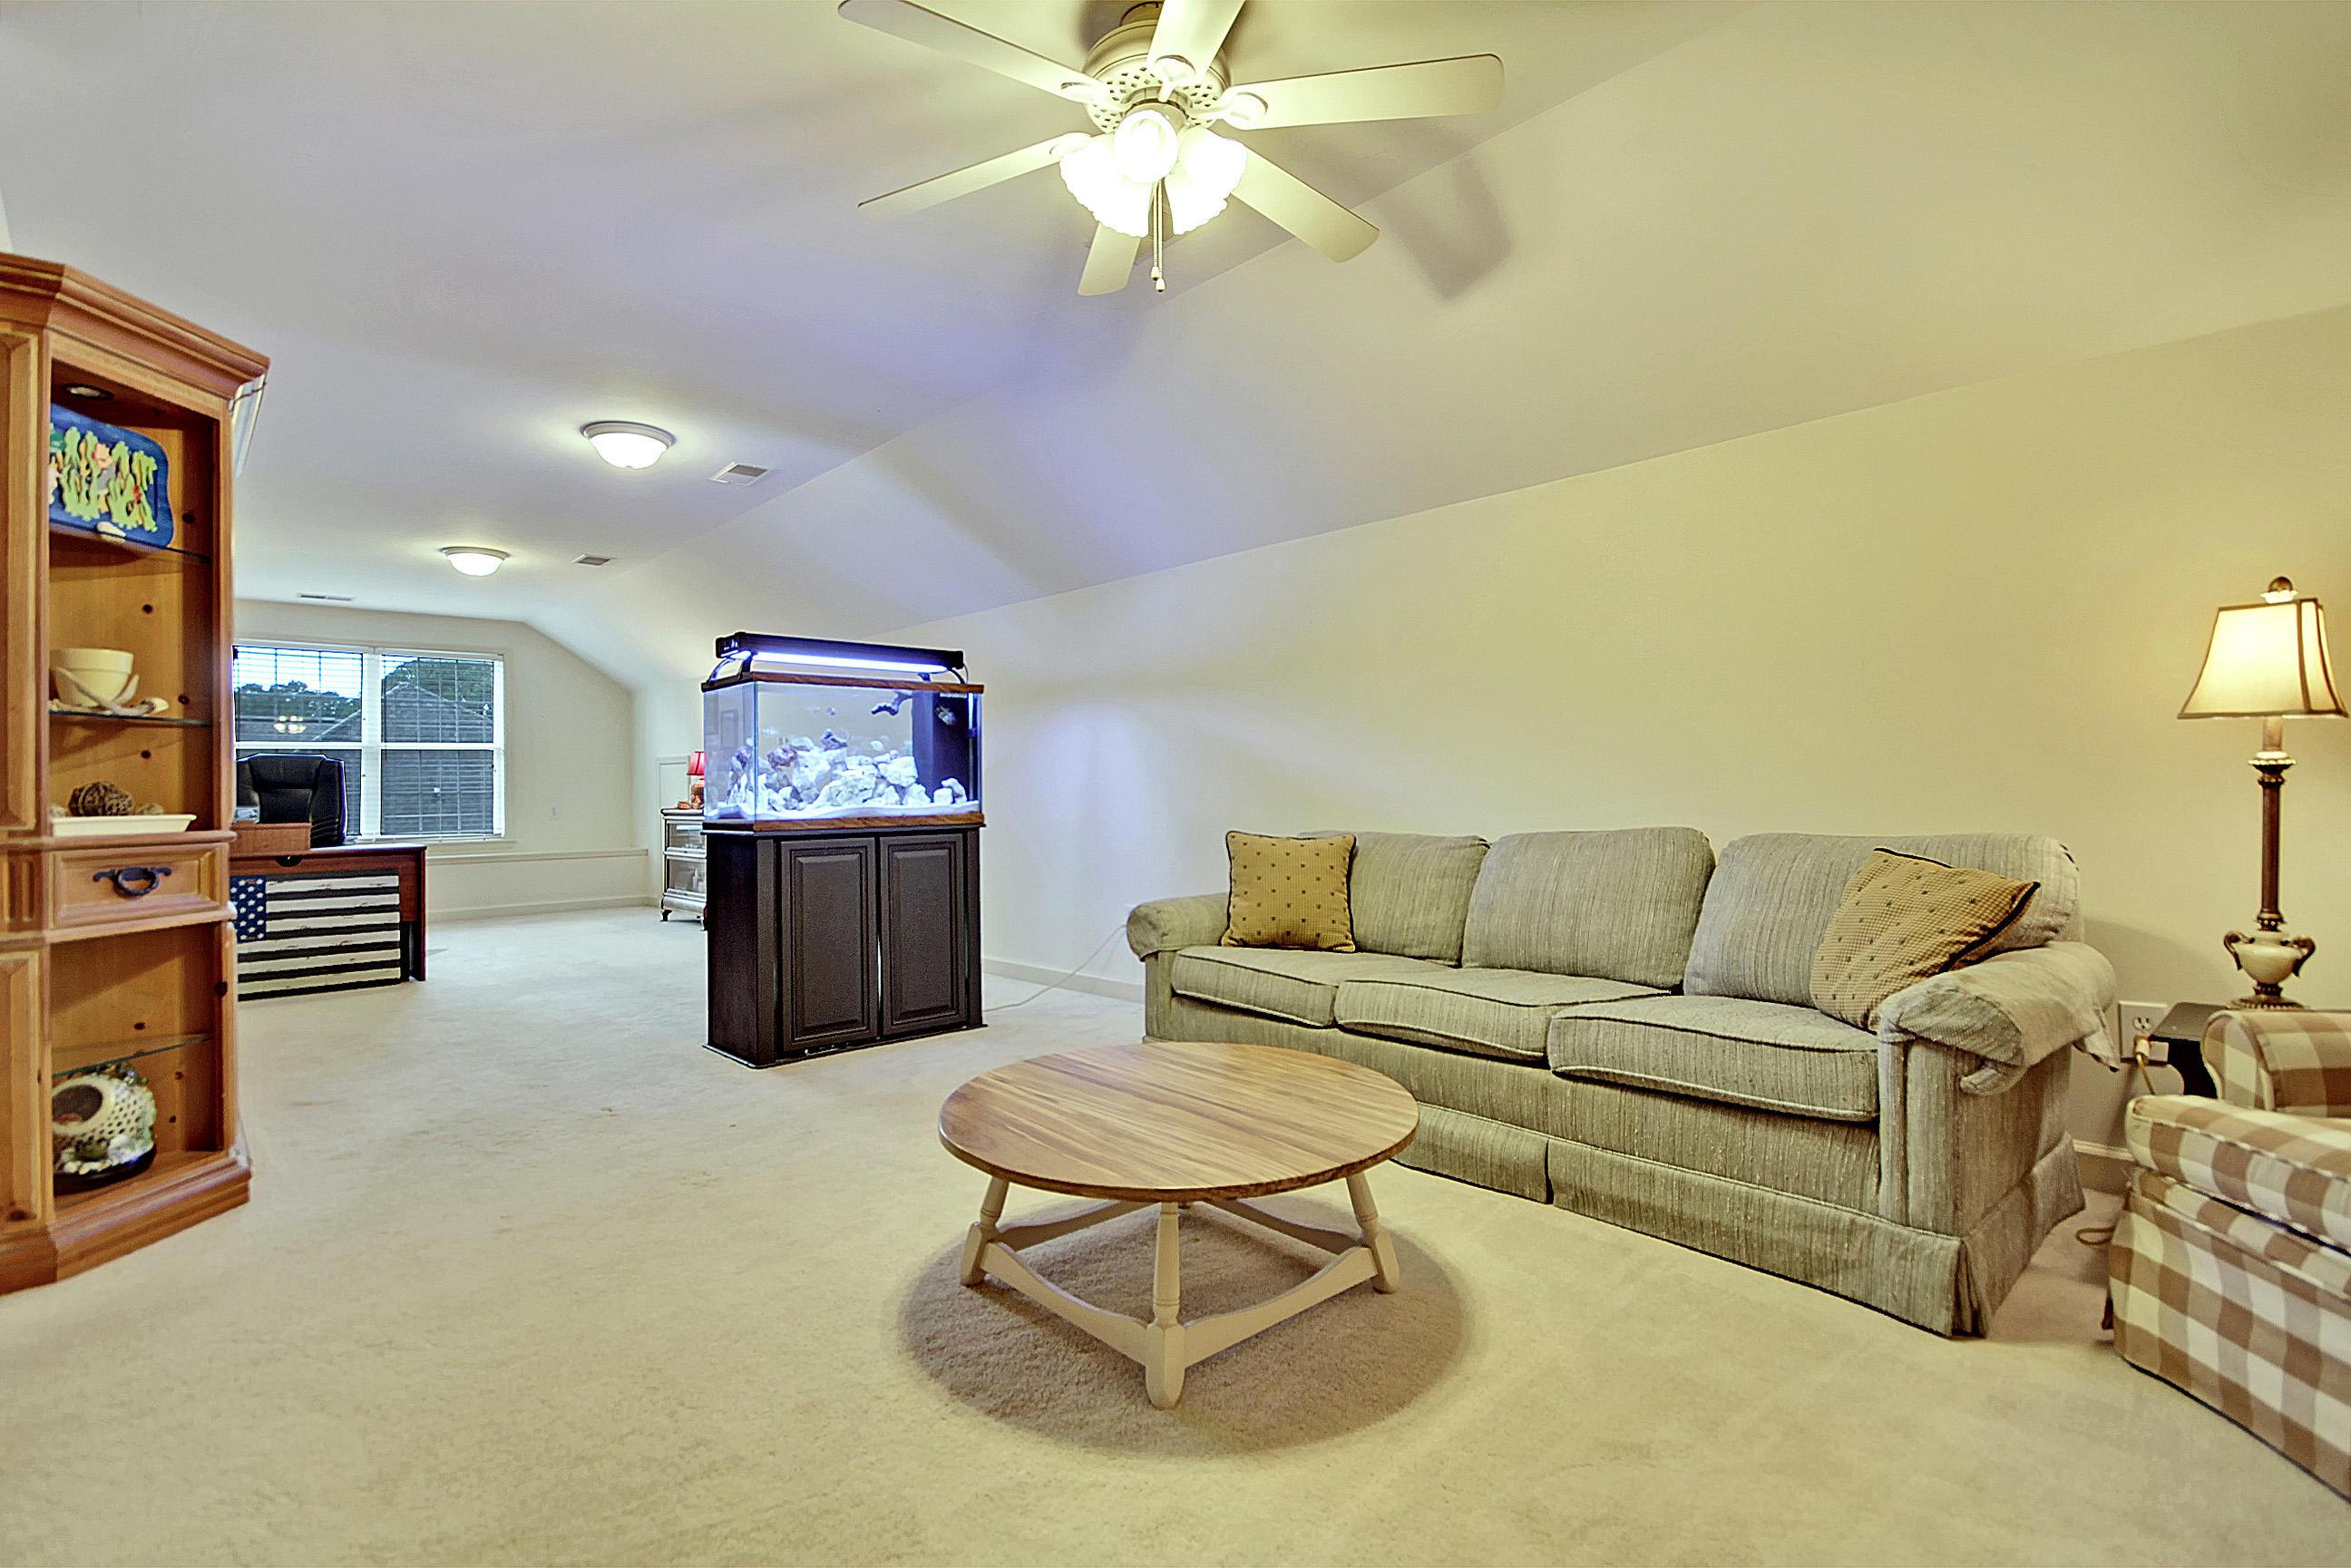 Dunes West Homes For Sale - 2449 Darts Cove, Mount Pleasant, SC - 14